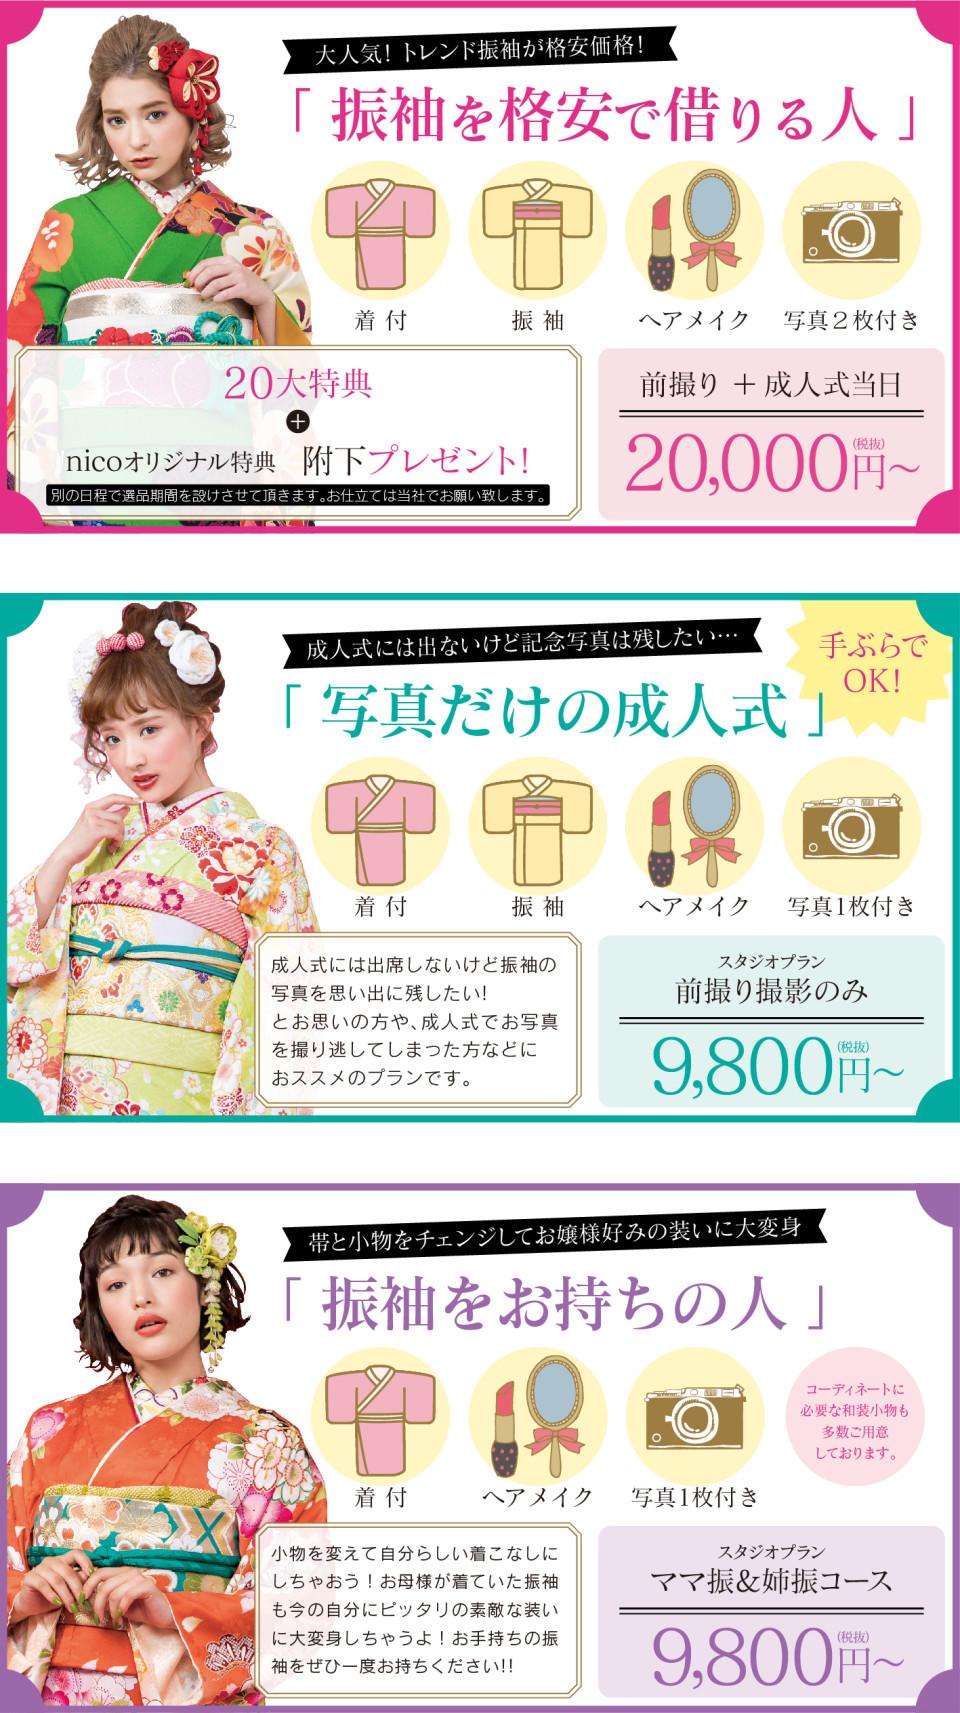 nico1801_myfurisode_banner-05